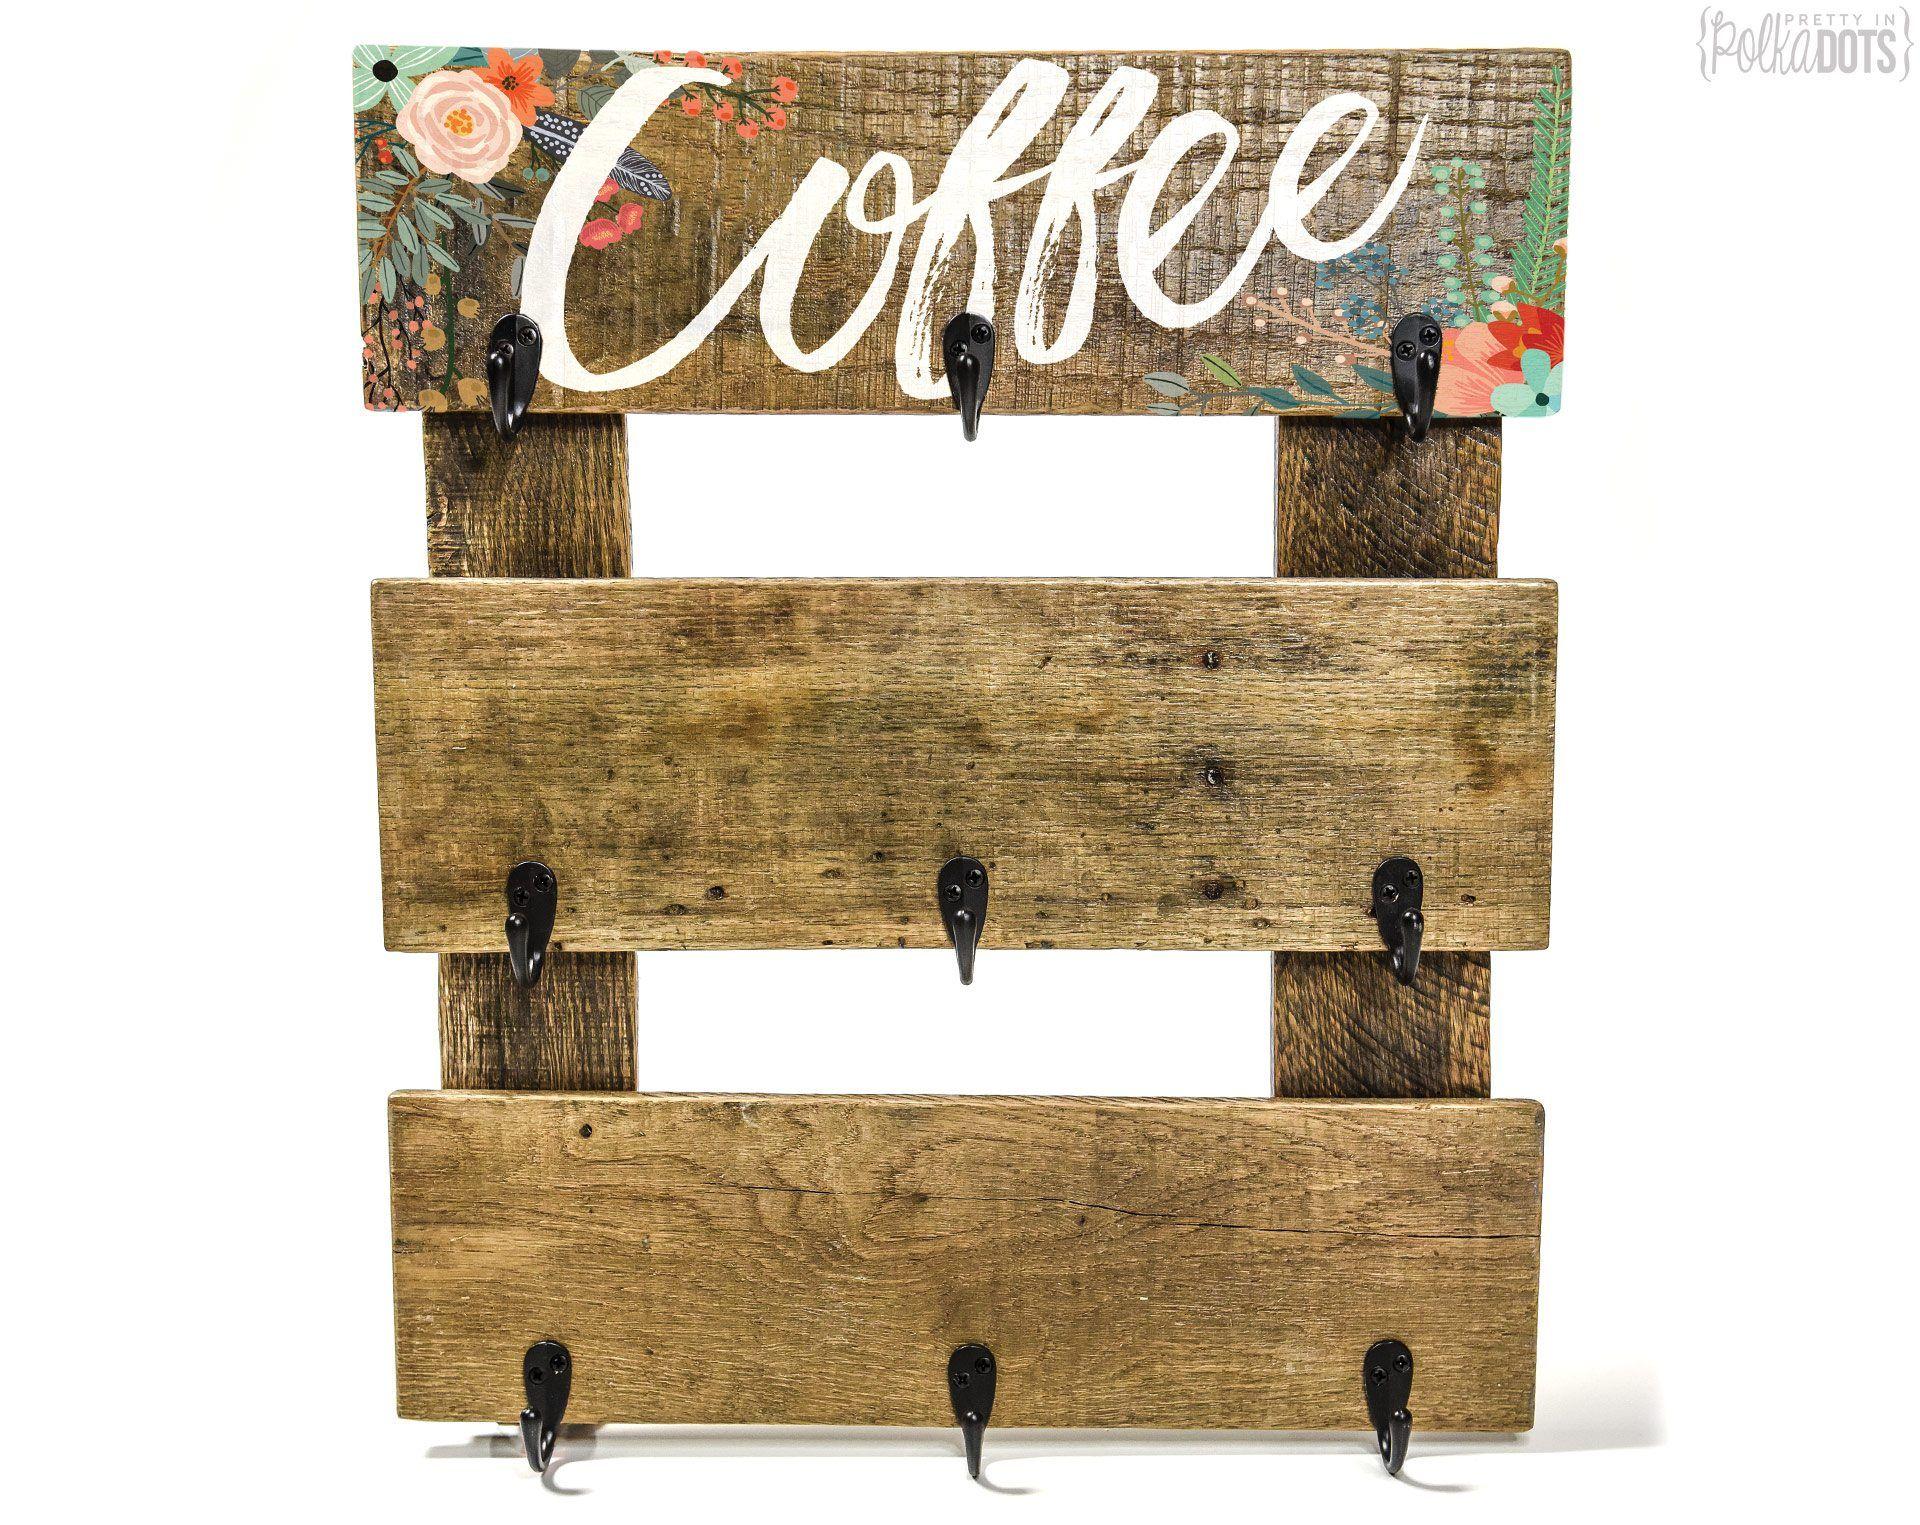 Coffee Cup Hanger Pretty In Polka Dots Floral mug rack